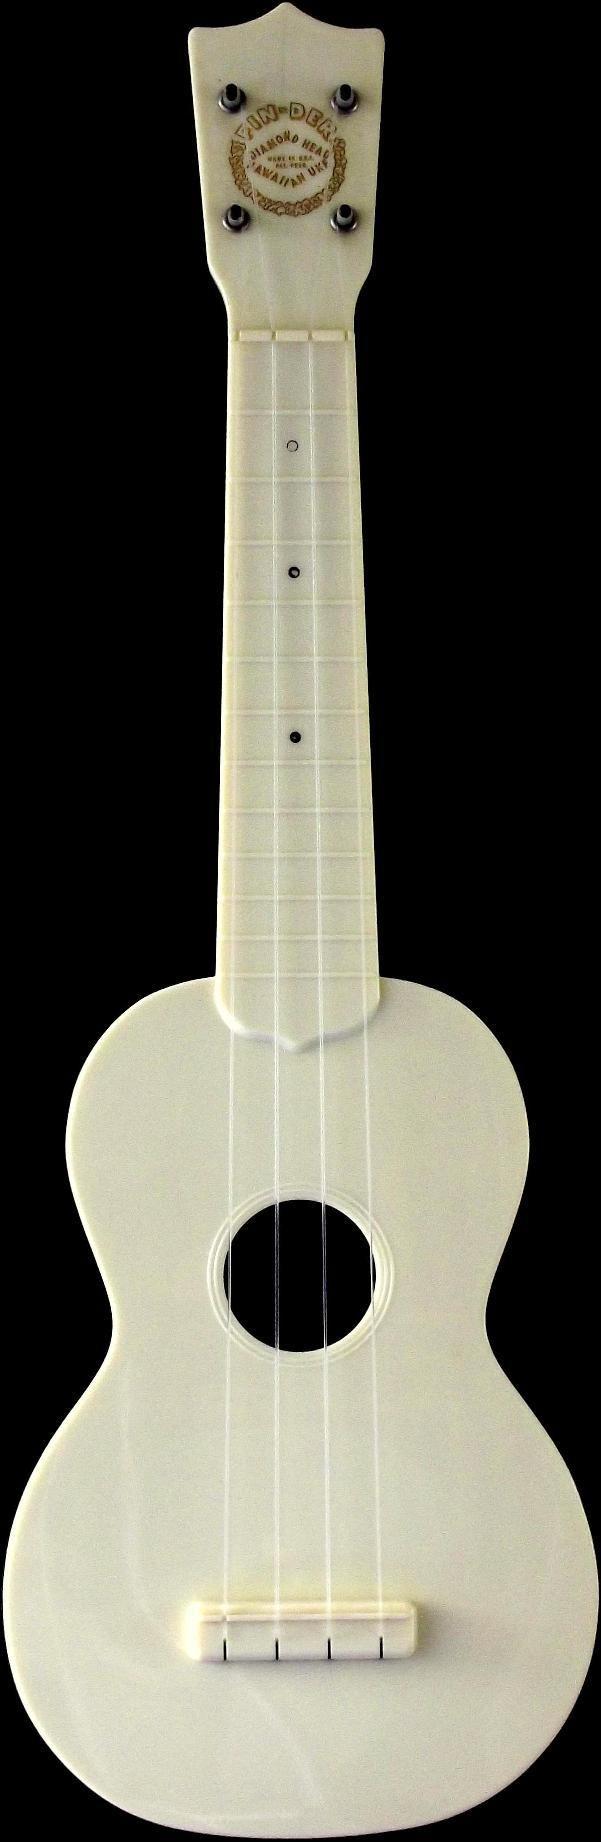 New pic of my Fin-Der Diamond Head Soprano  #LardysUkuleleOfTheDay #Ukulele ~ https://www.pinterest.com/lardyfatboy/lardys-ukulele-of-the-day/ ~